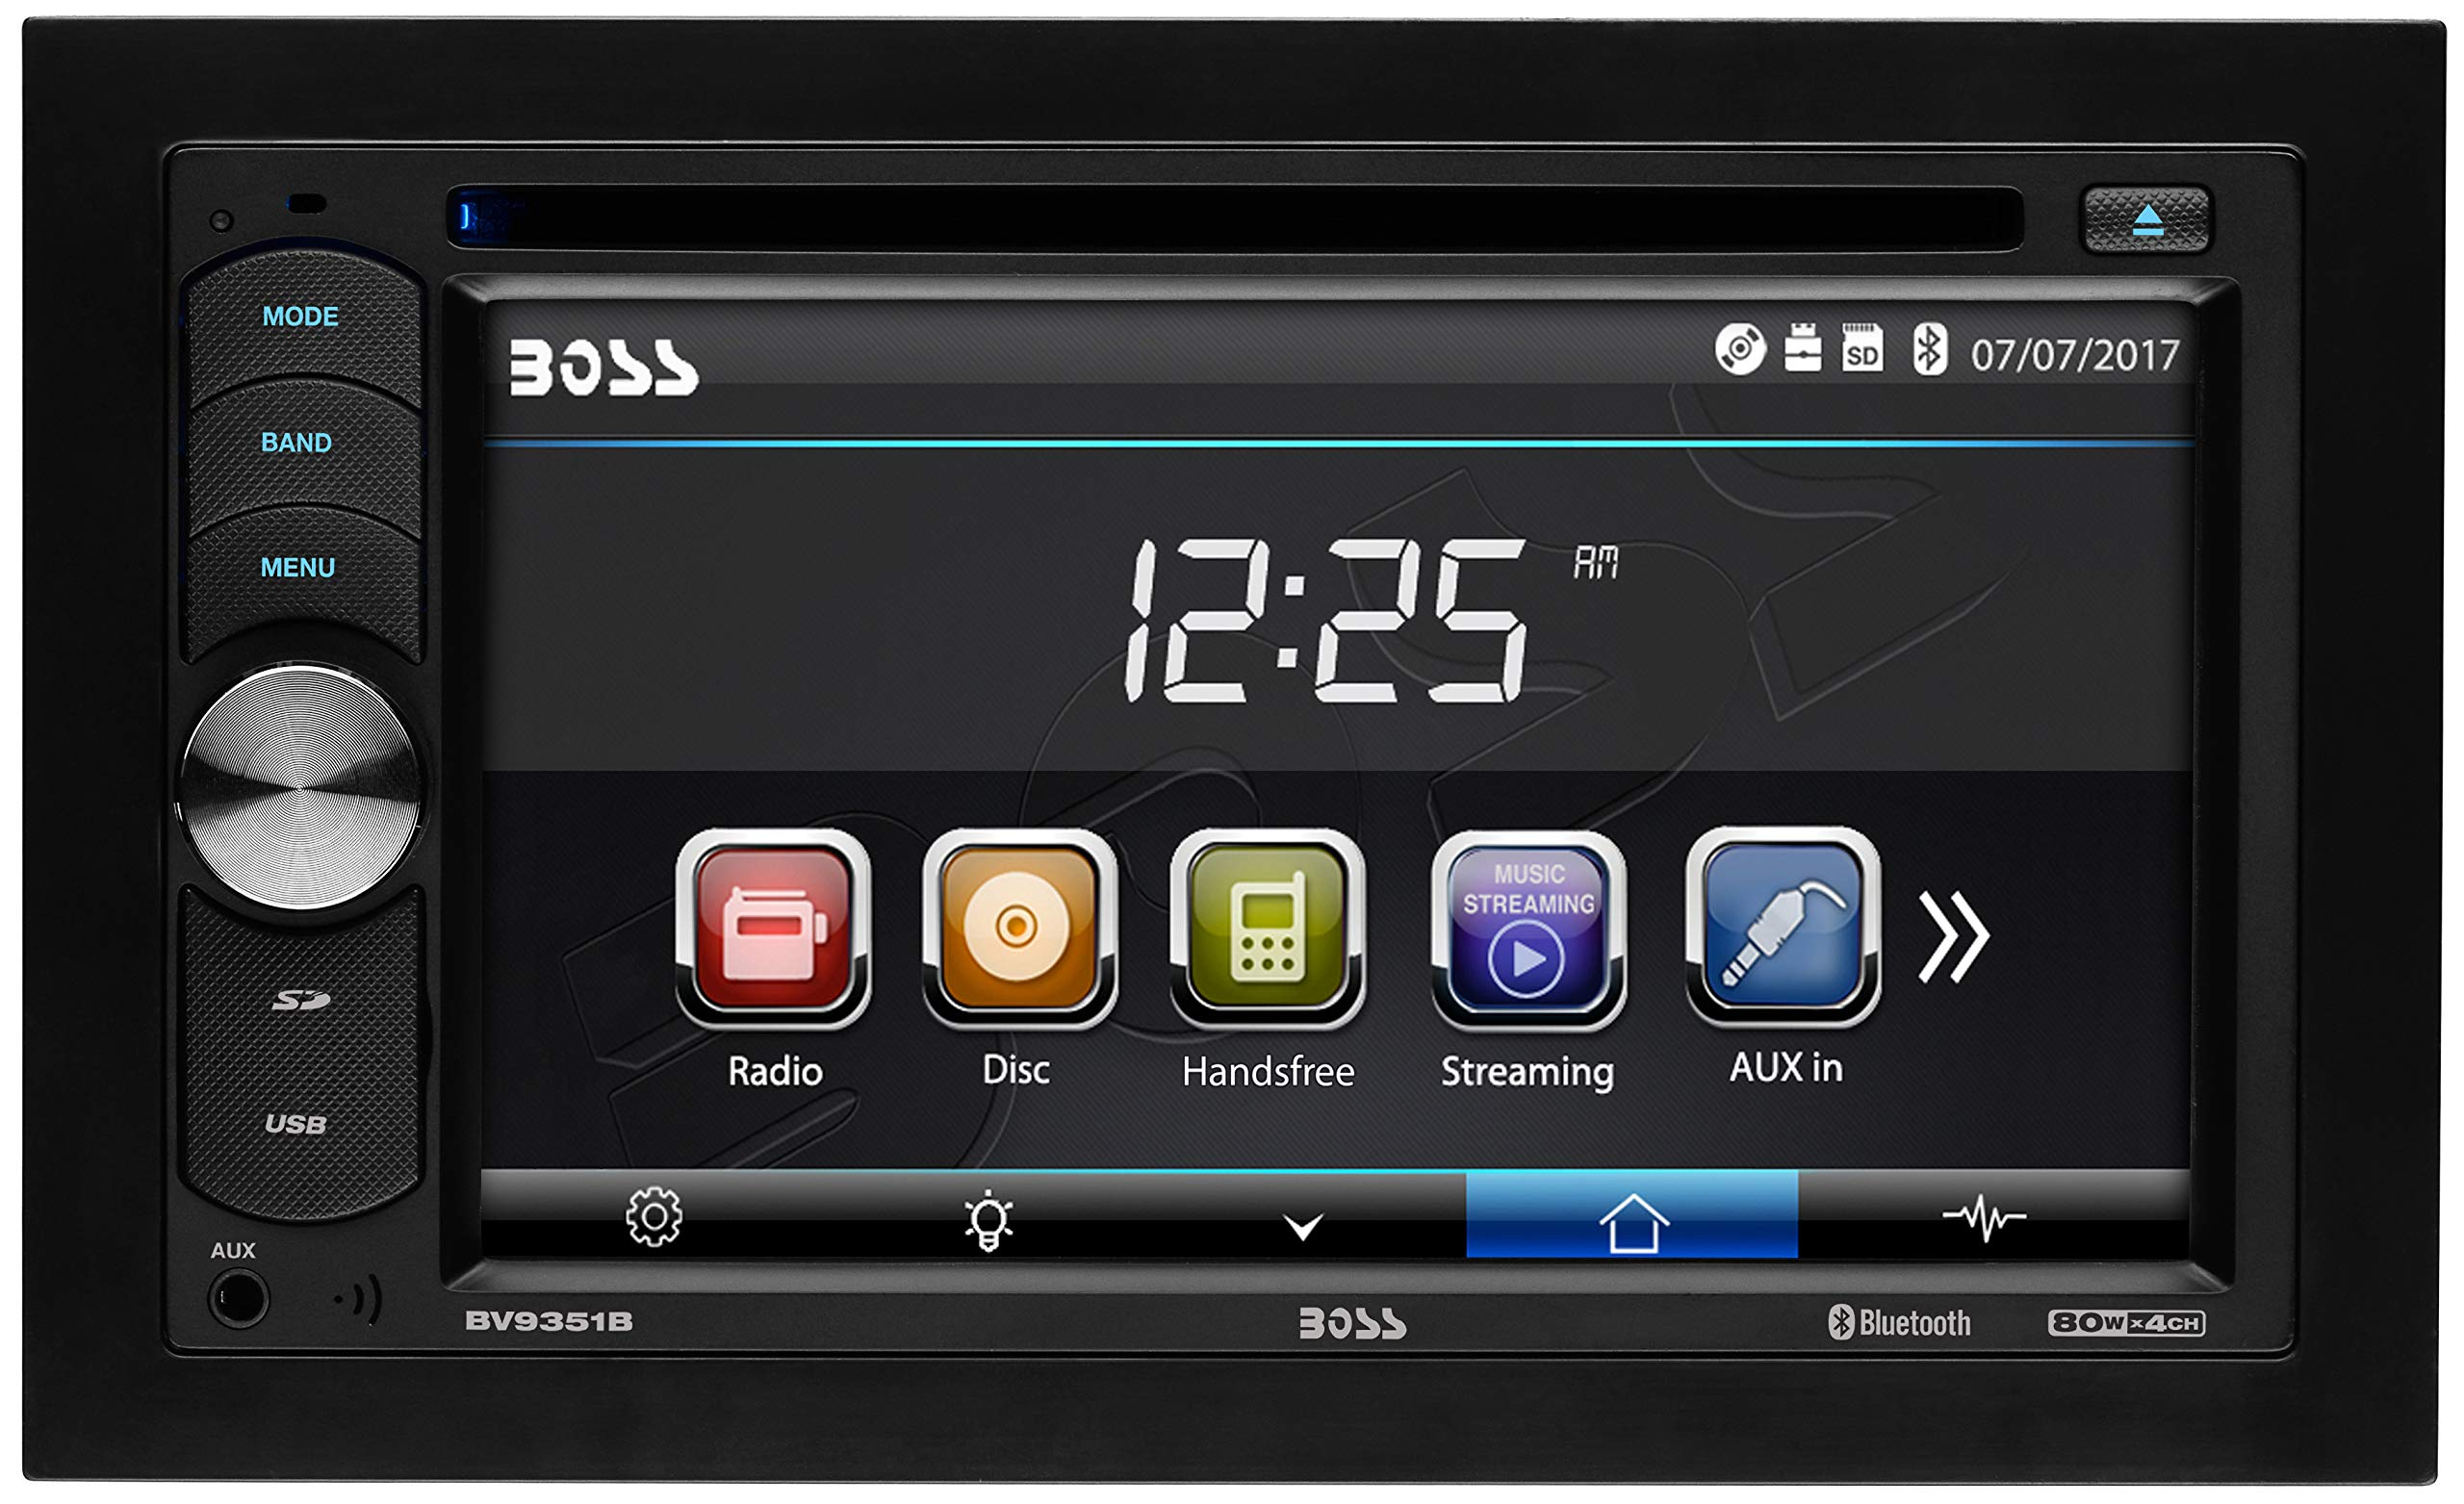 BOSS Audio BV9351B Double Din, Touchscreen, Bluetooth, DVD/CD/MP3/USB/SD AM/FM Car Stereo, 6.2 Inch Digital LCD Monitor, Wireless Remote